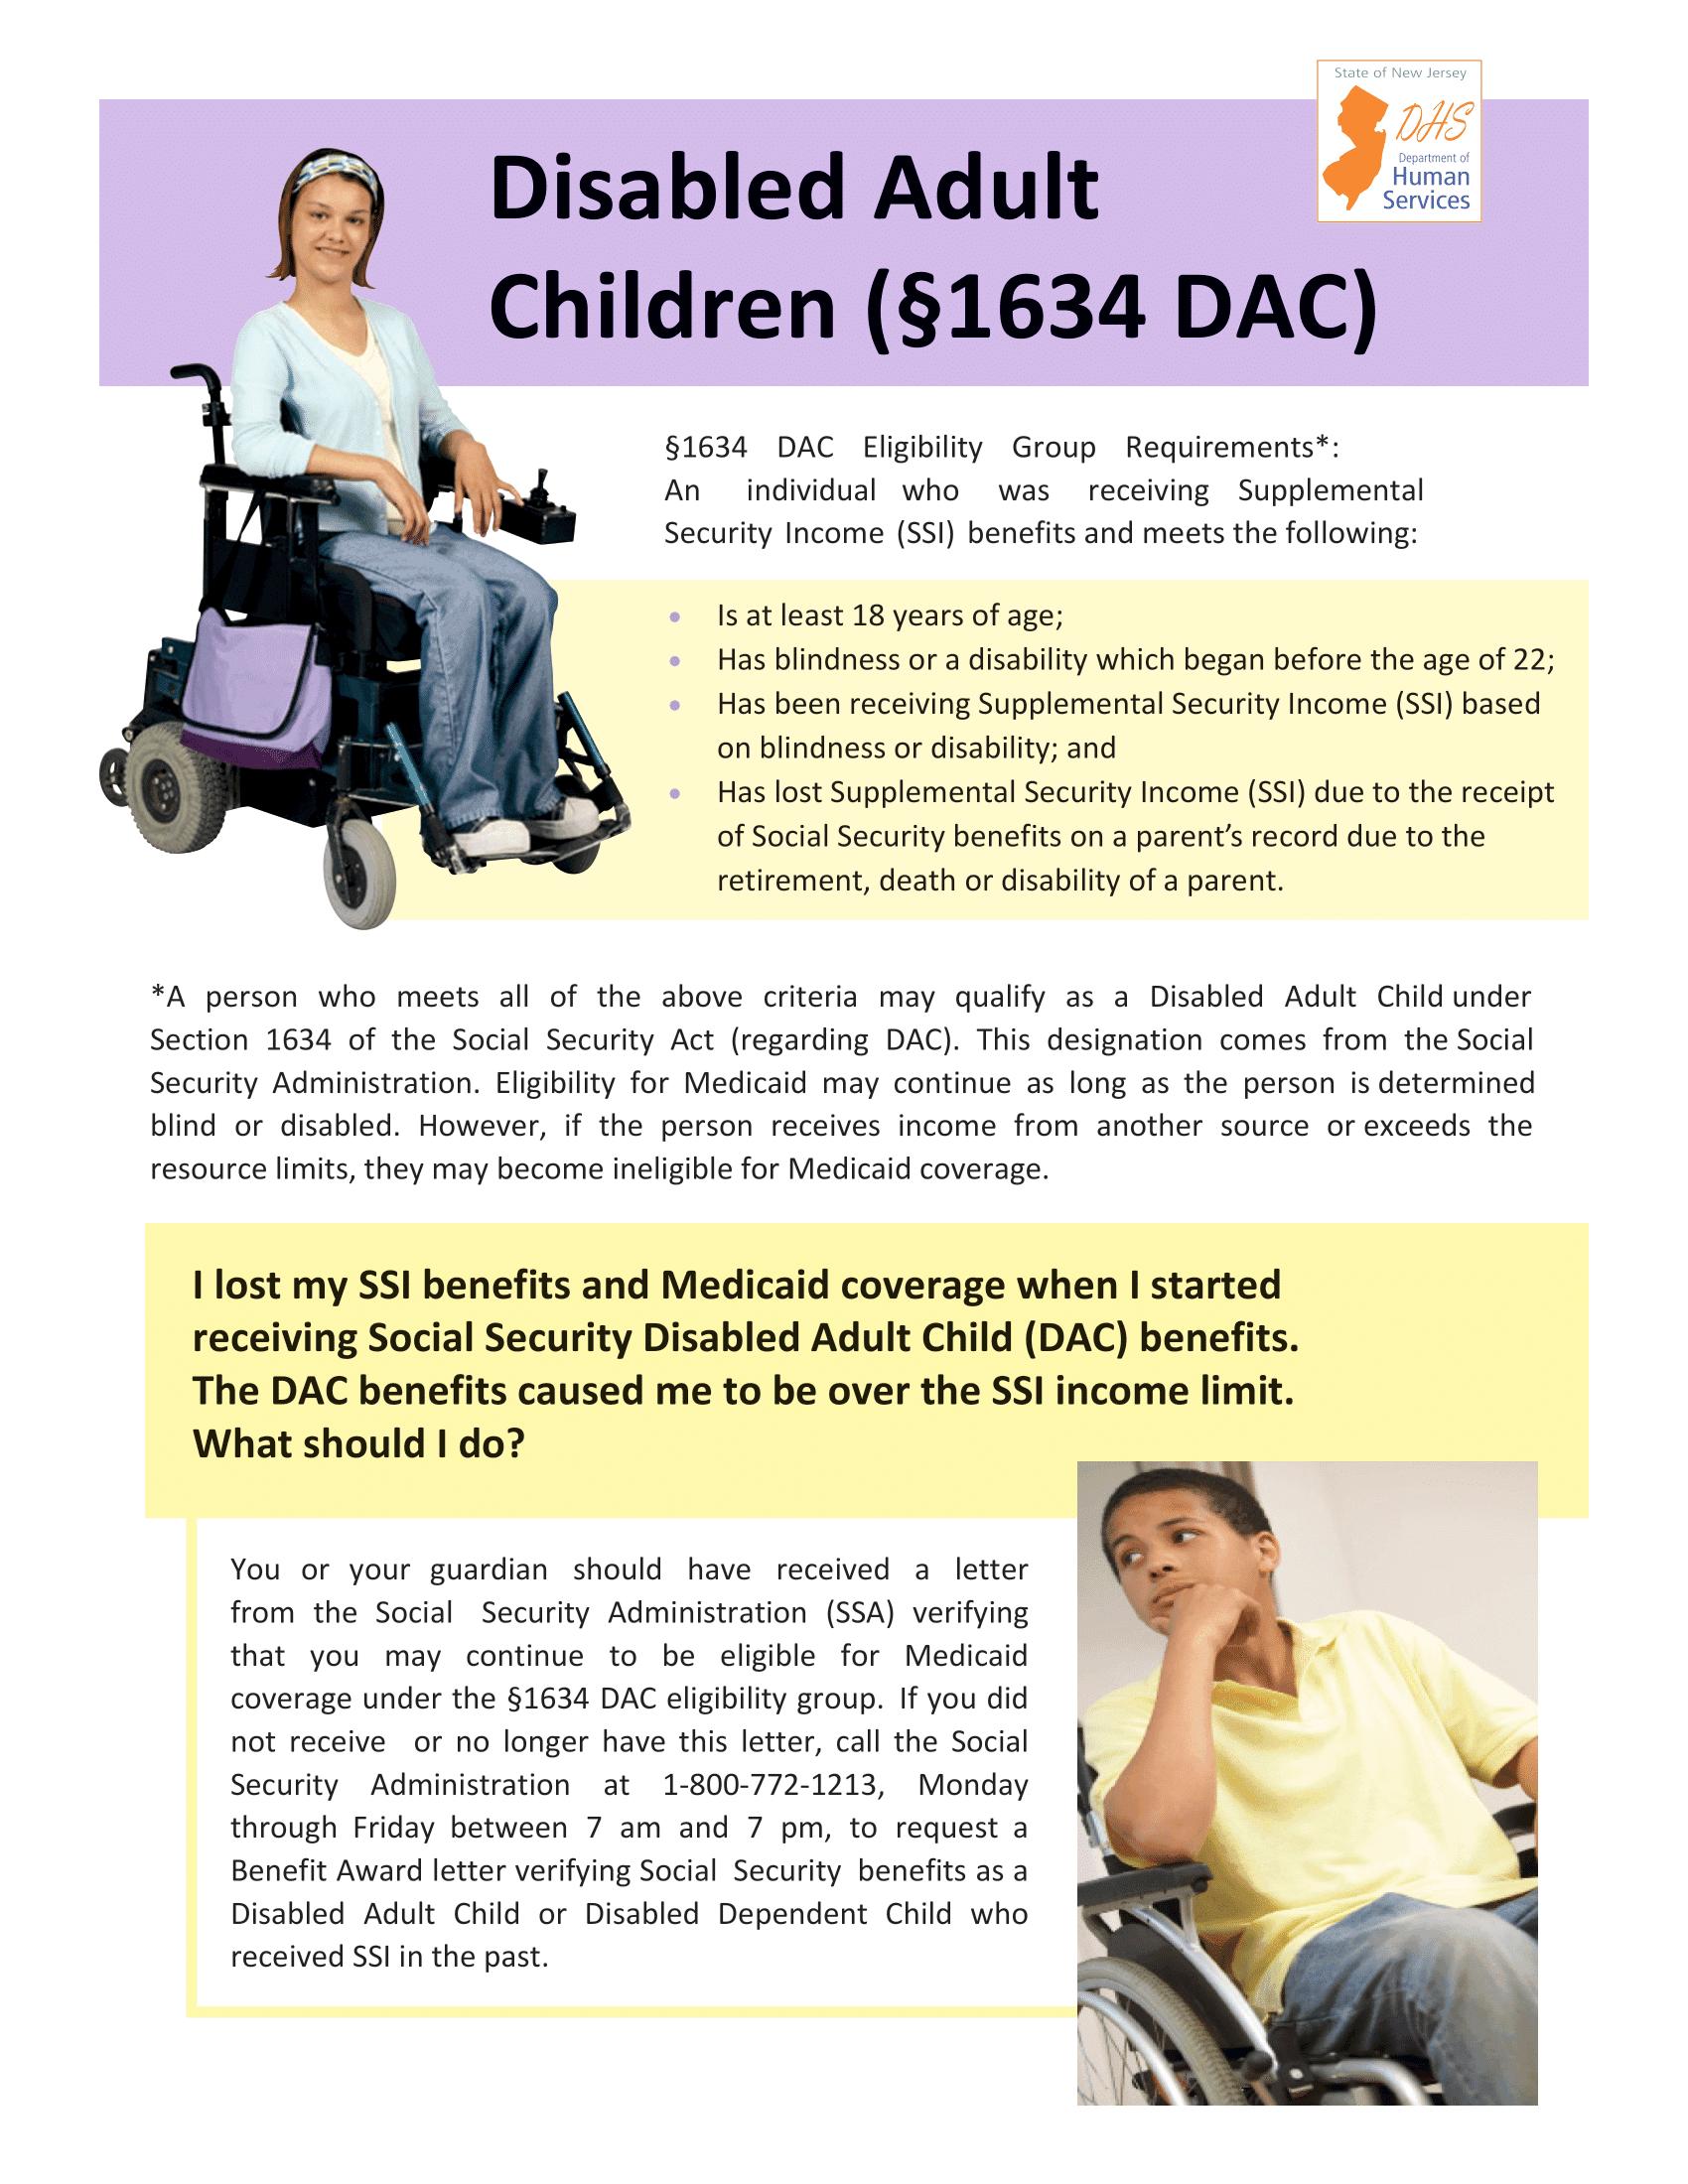 Disabled Adult Children (Regarding Medicaid)